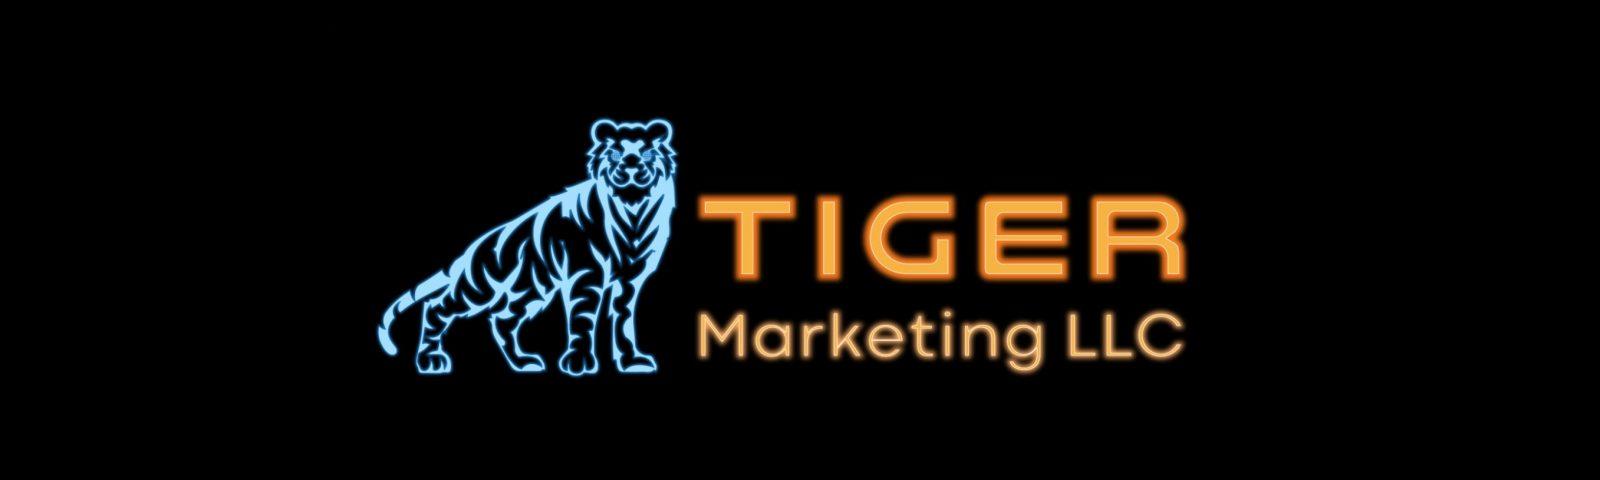 tiger marketing llc